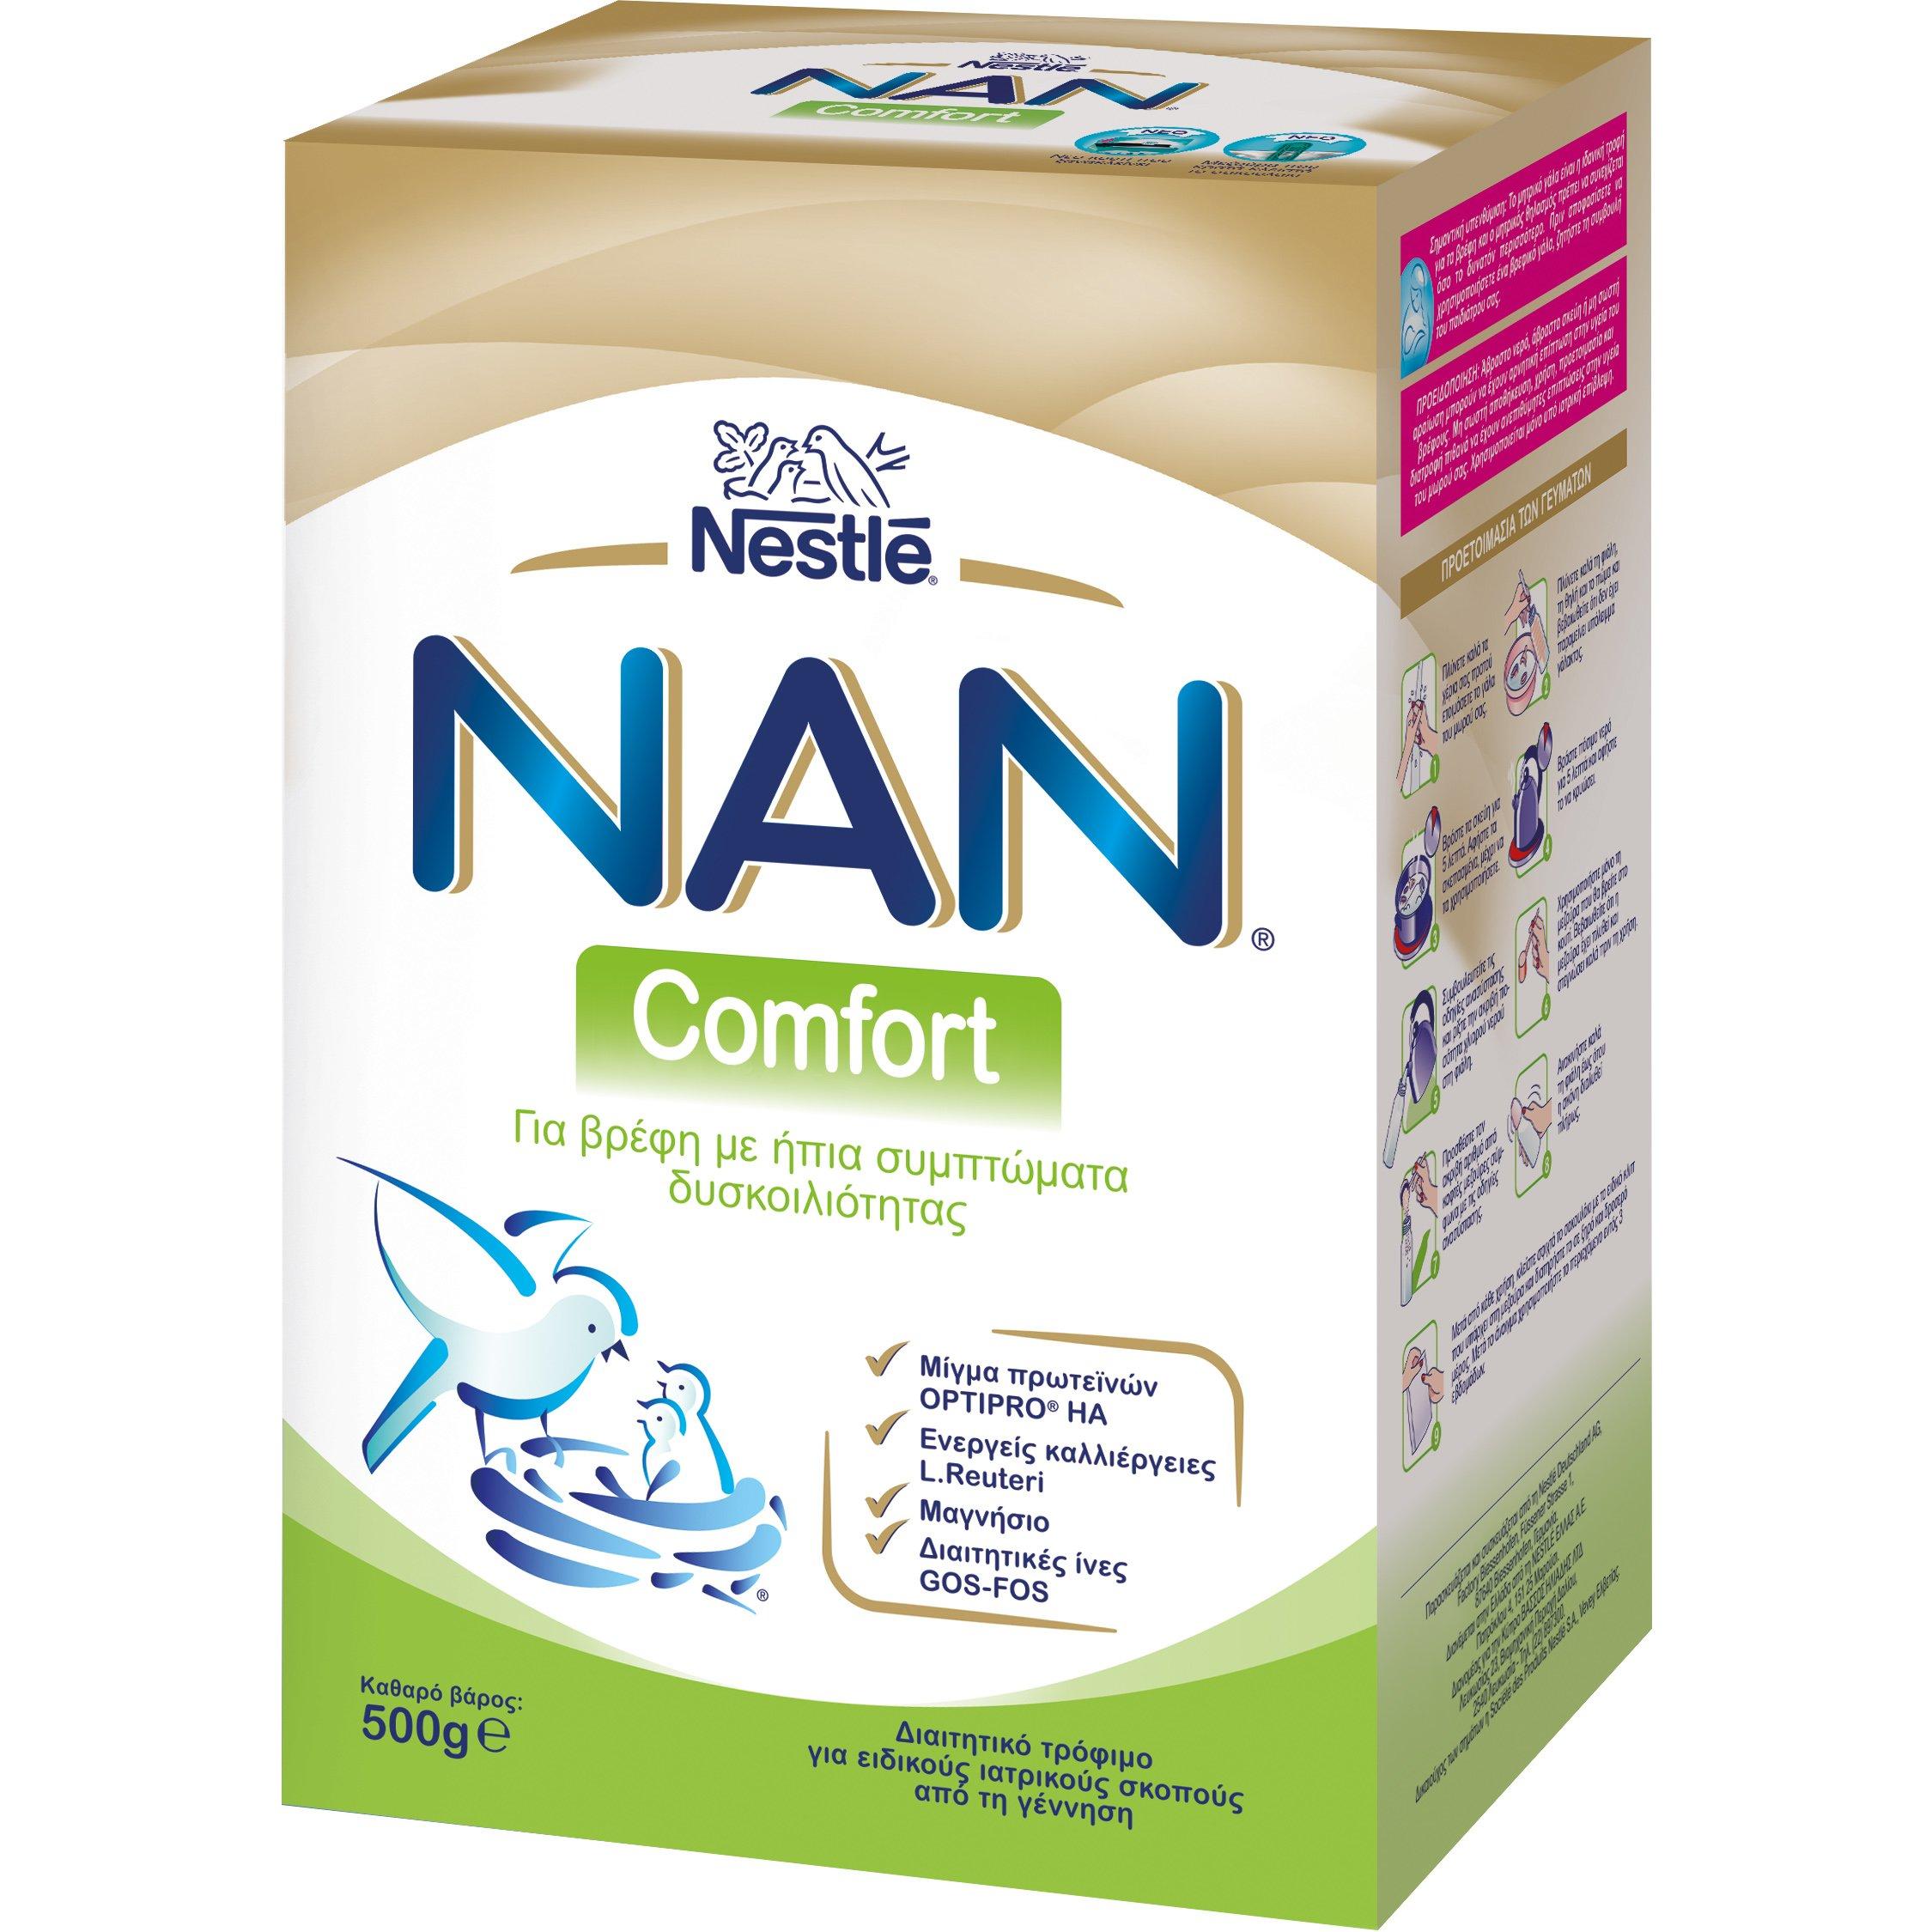 Nestle NAN Comfort Γάλα σε Σκόνη για Βρέφη με Ήπια Συμπτώματα Δυσκοιλιότητας, από την Γέννηση 500gr